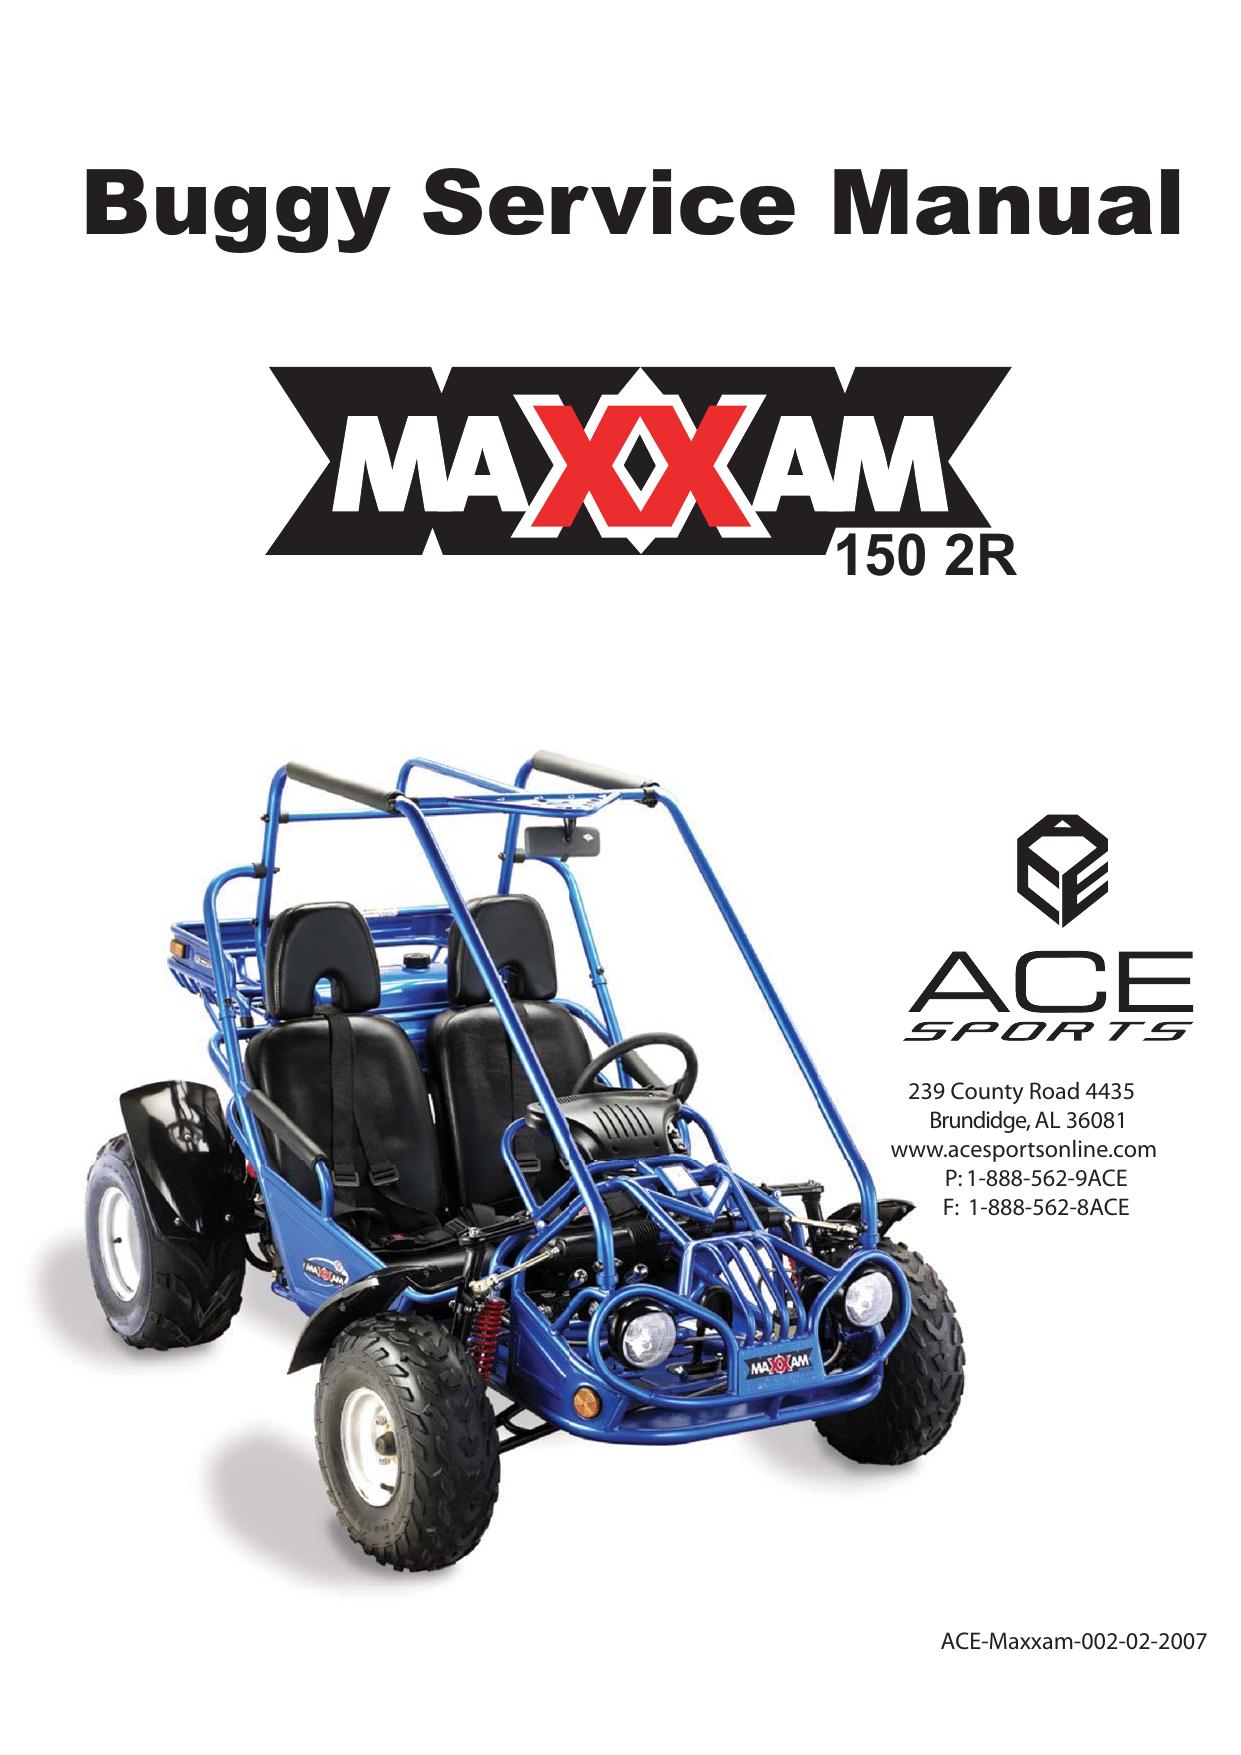 ACE Maxxam 150 2R Service Manual | manualzz.com on